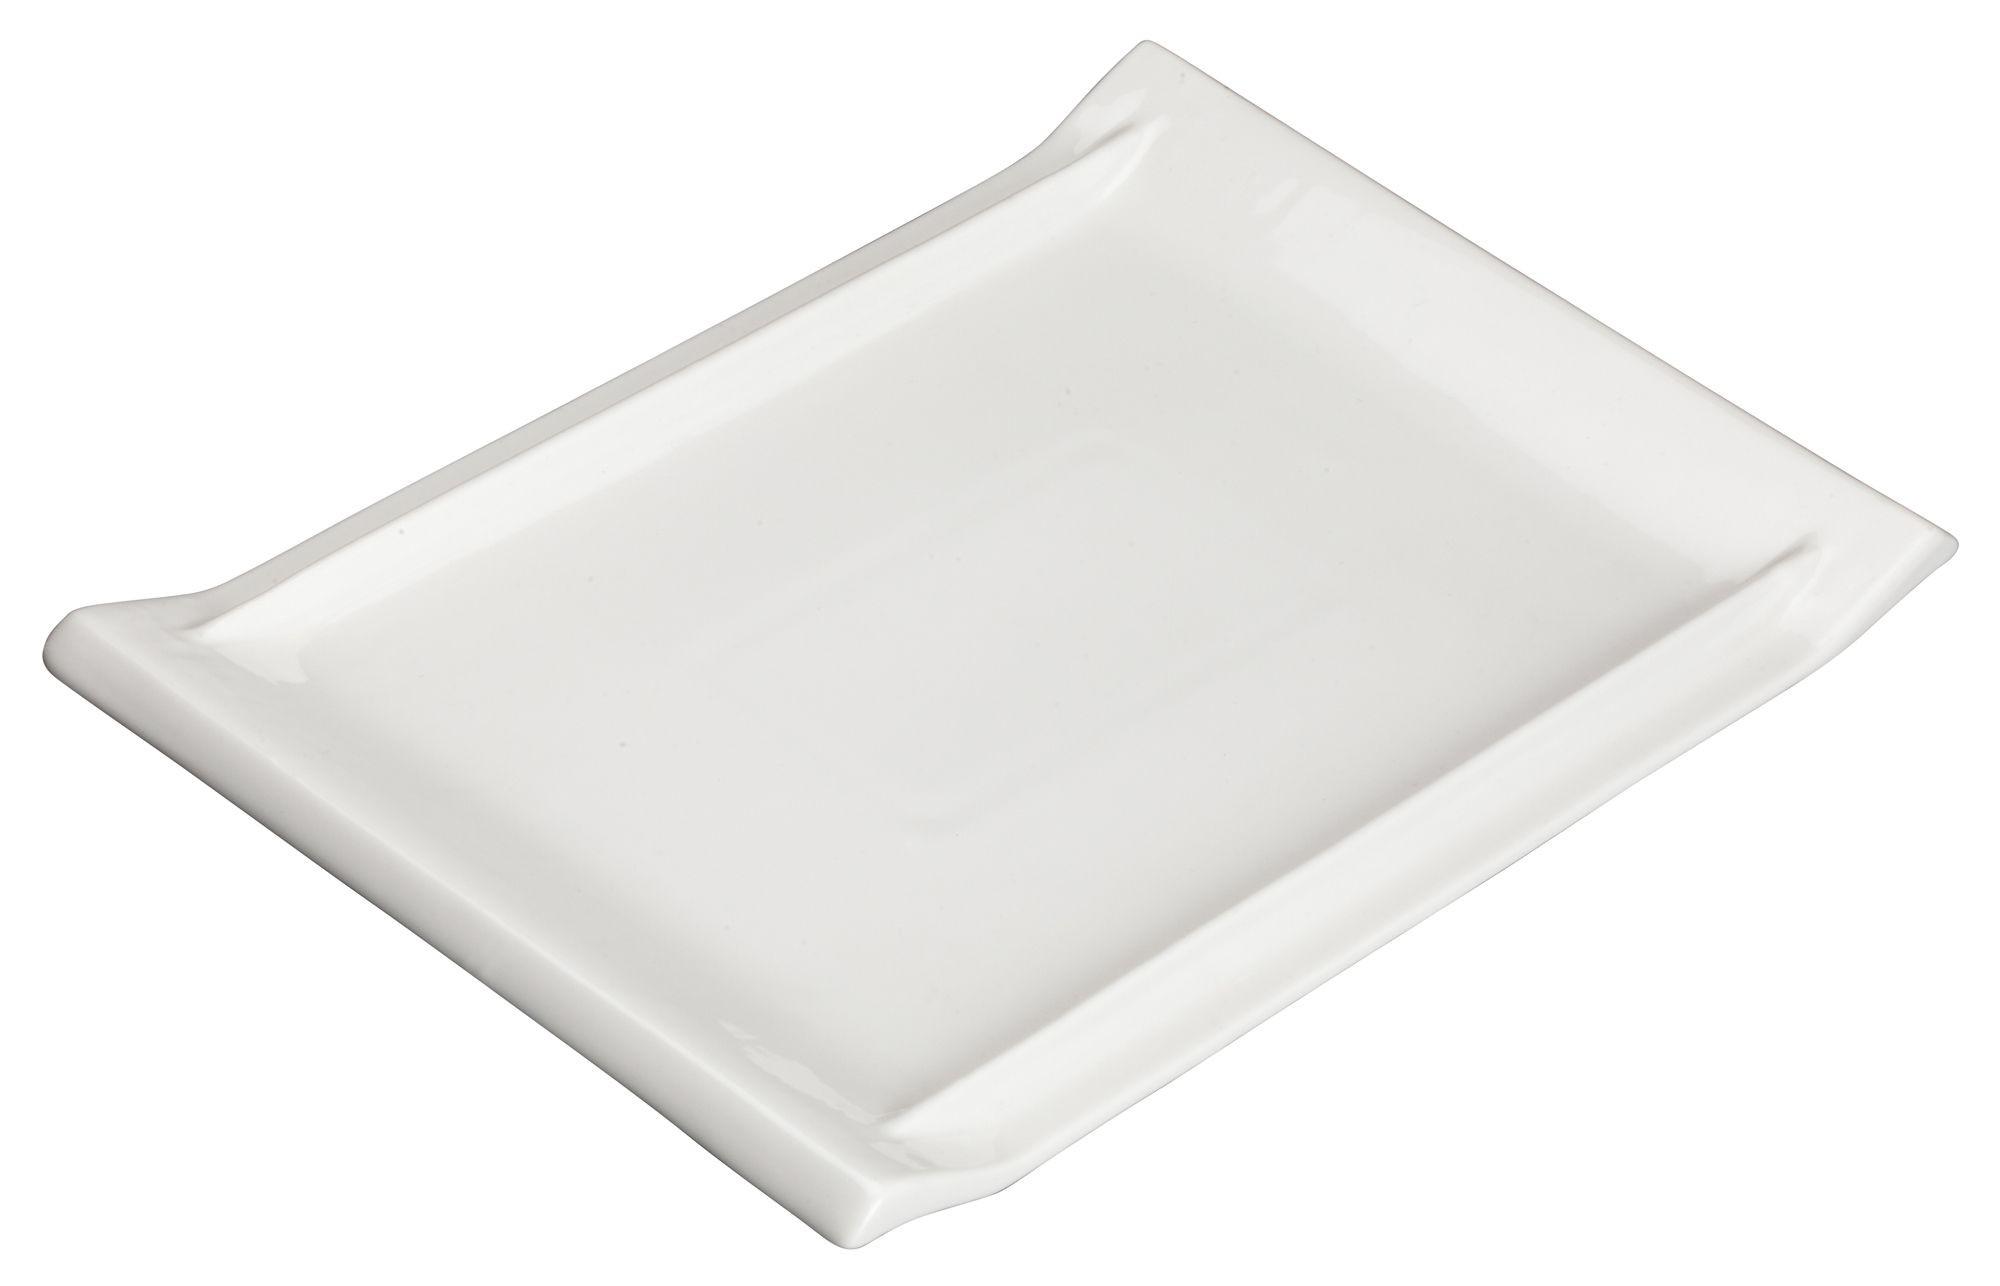 "Winco WDP017-113 Tollaro Porcelain Bright White Rectangular Platter 13-7/8"" x 9-1/4"""